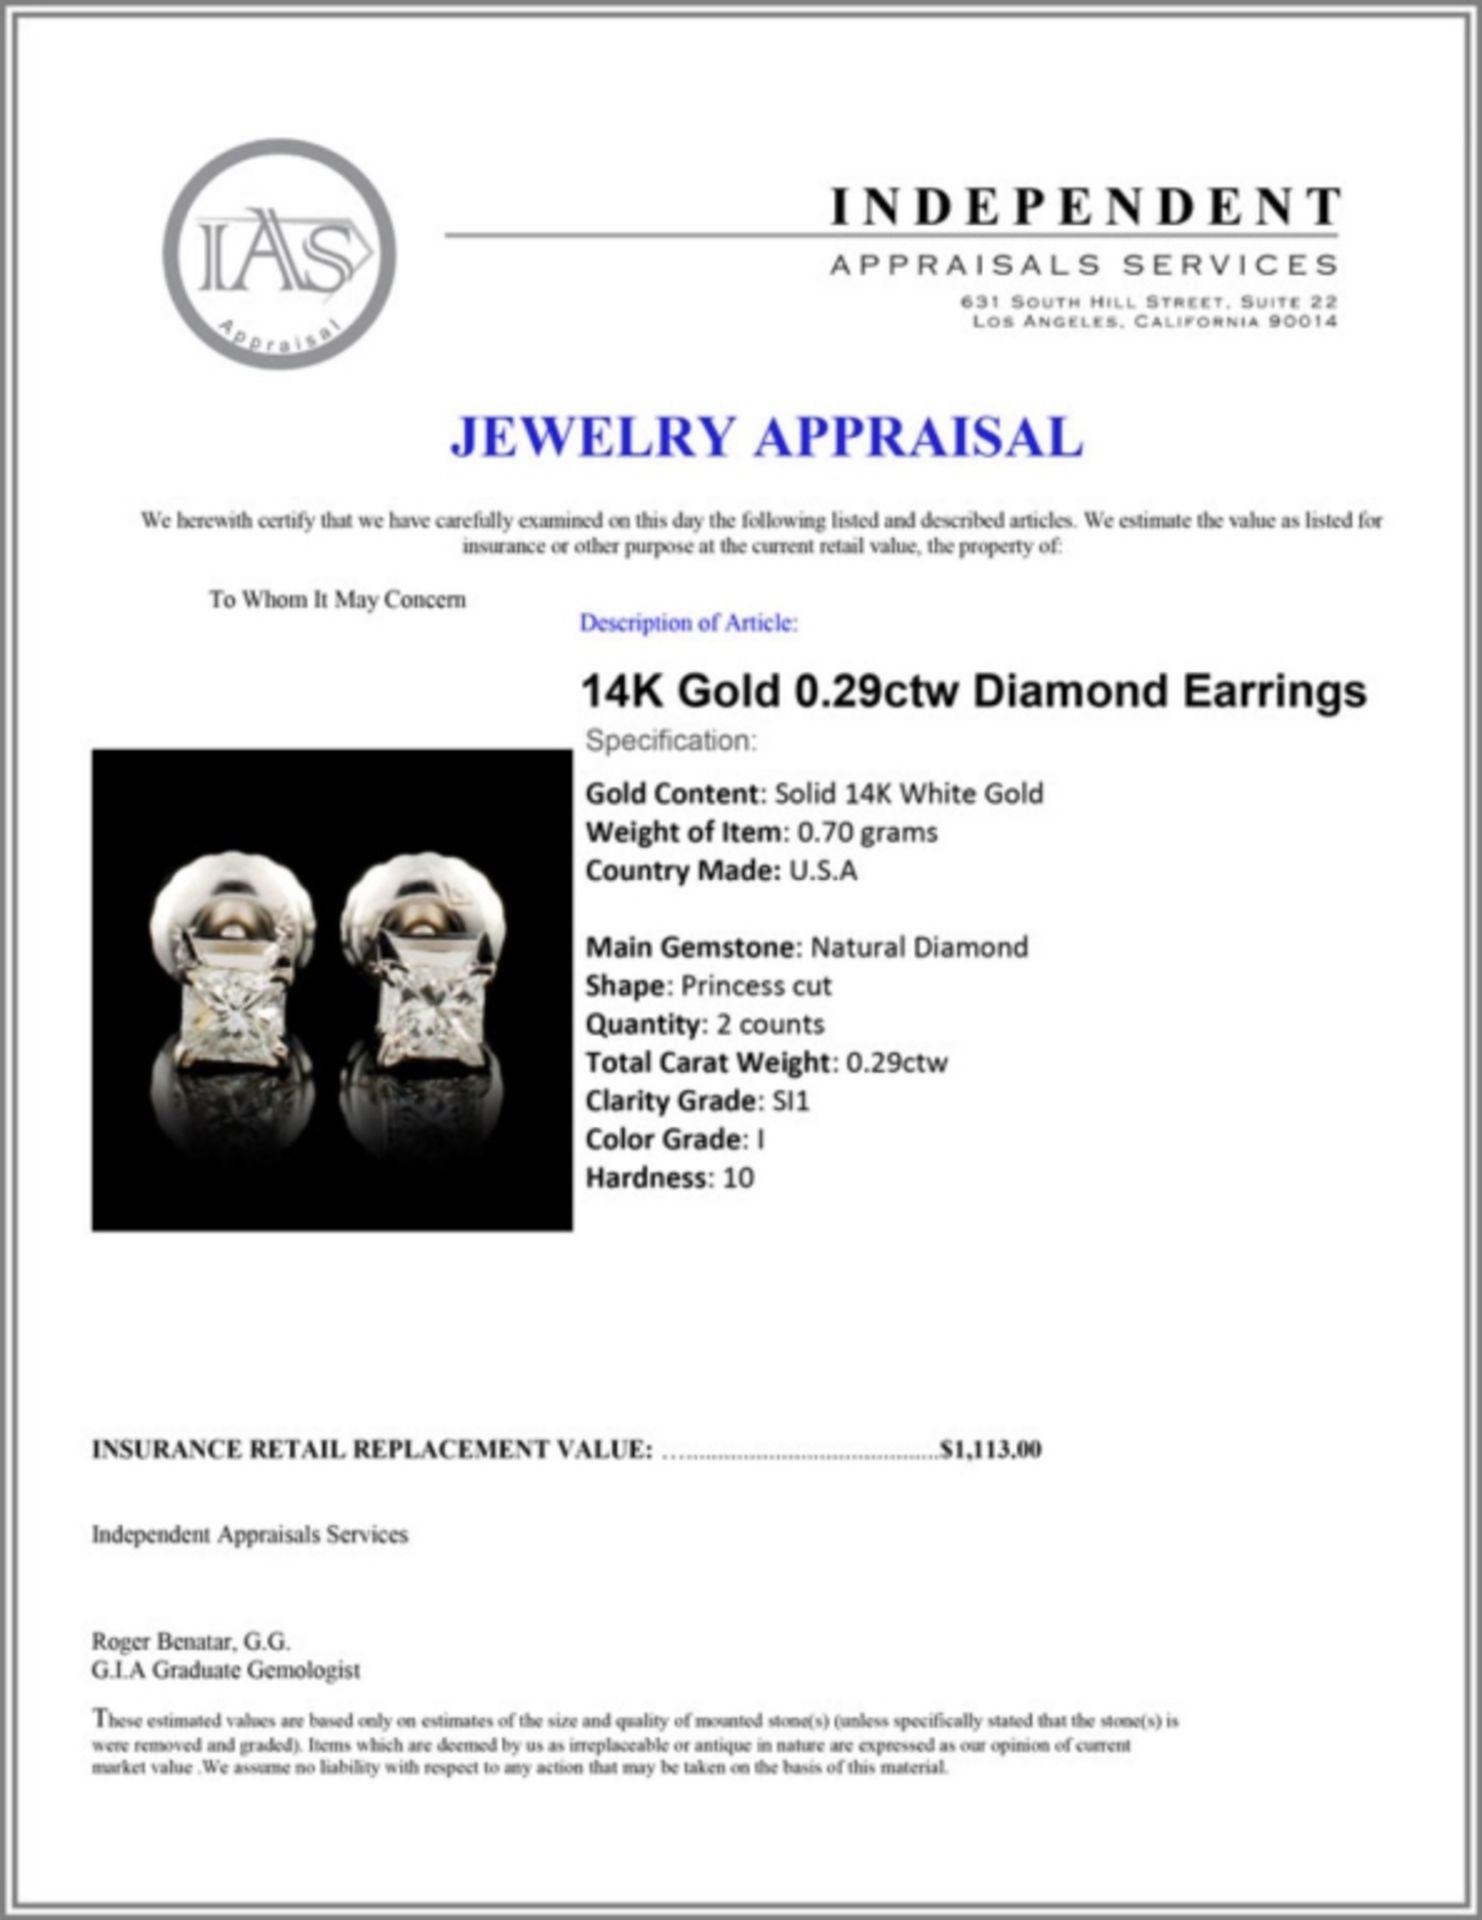 14K Gold 0.29ctw Diamond Earrings - Image 3 of 3